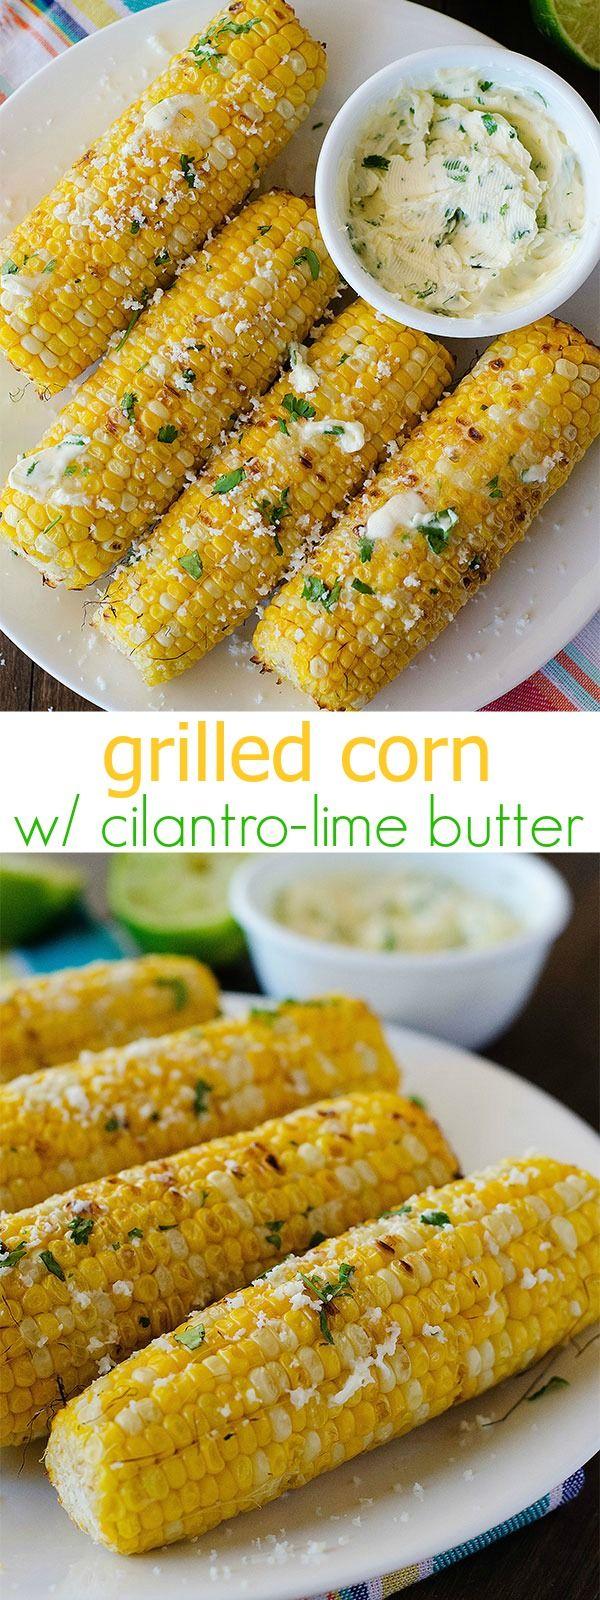 grilled corn, summer recipes, bbq, corn,